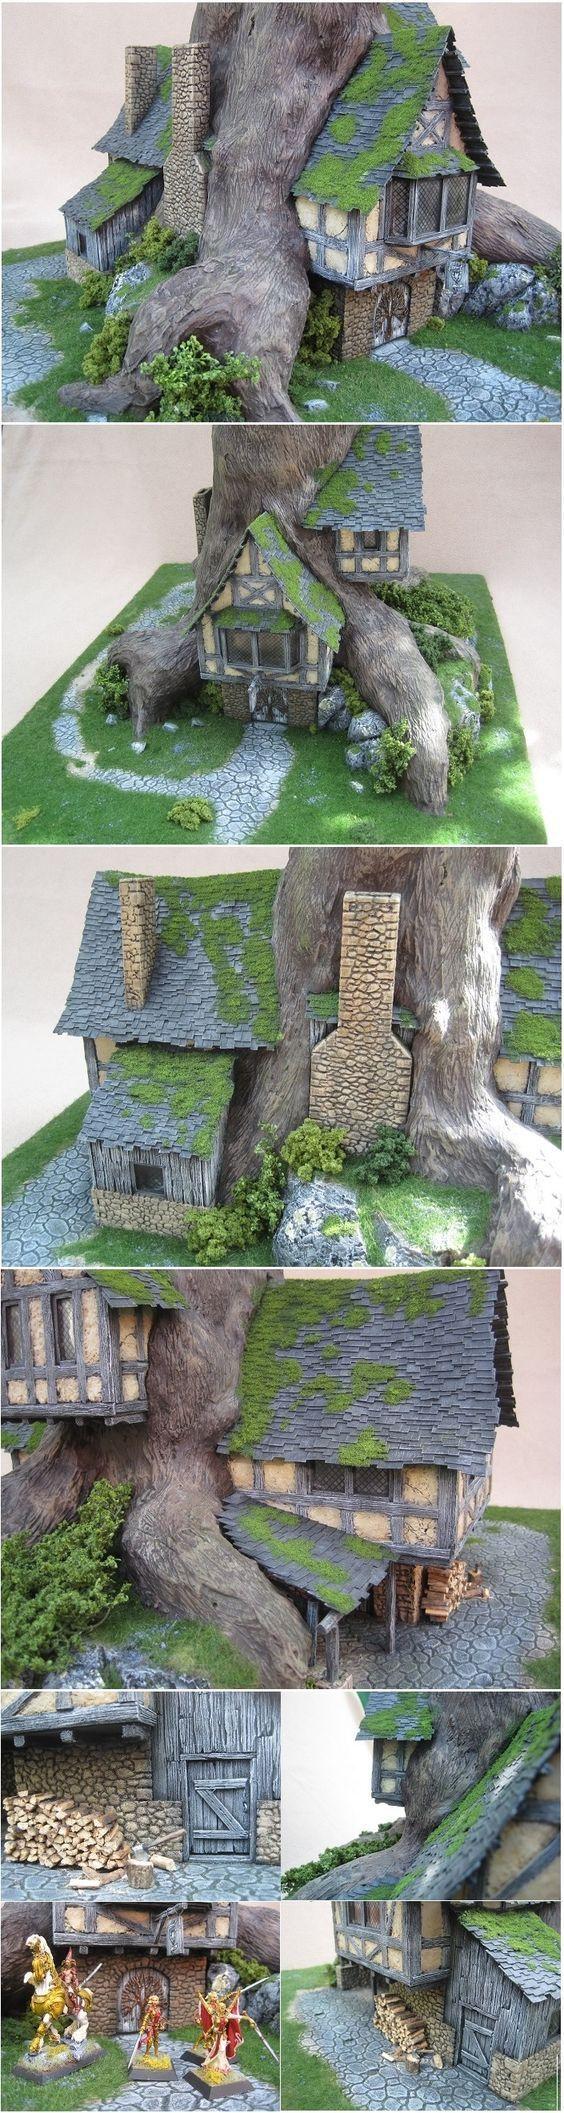 Miniature Tree House miniature tree houses ideas to mesmerize you | miniature trees